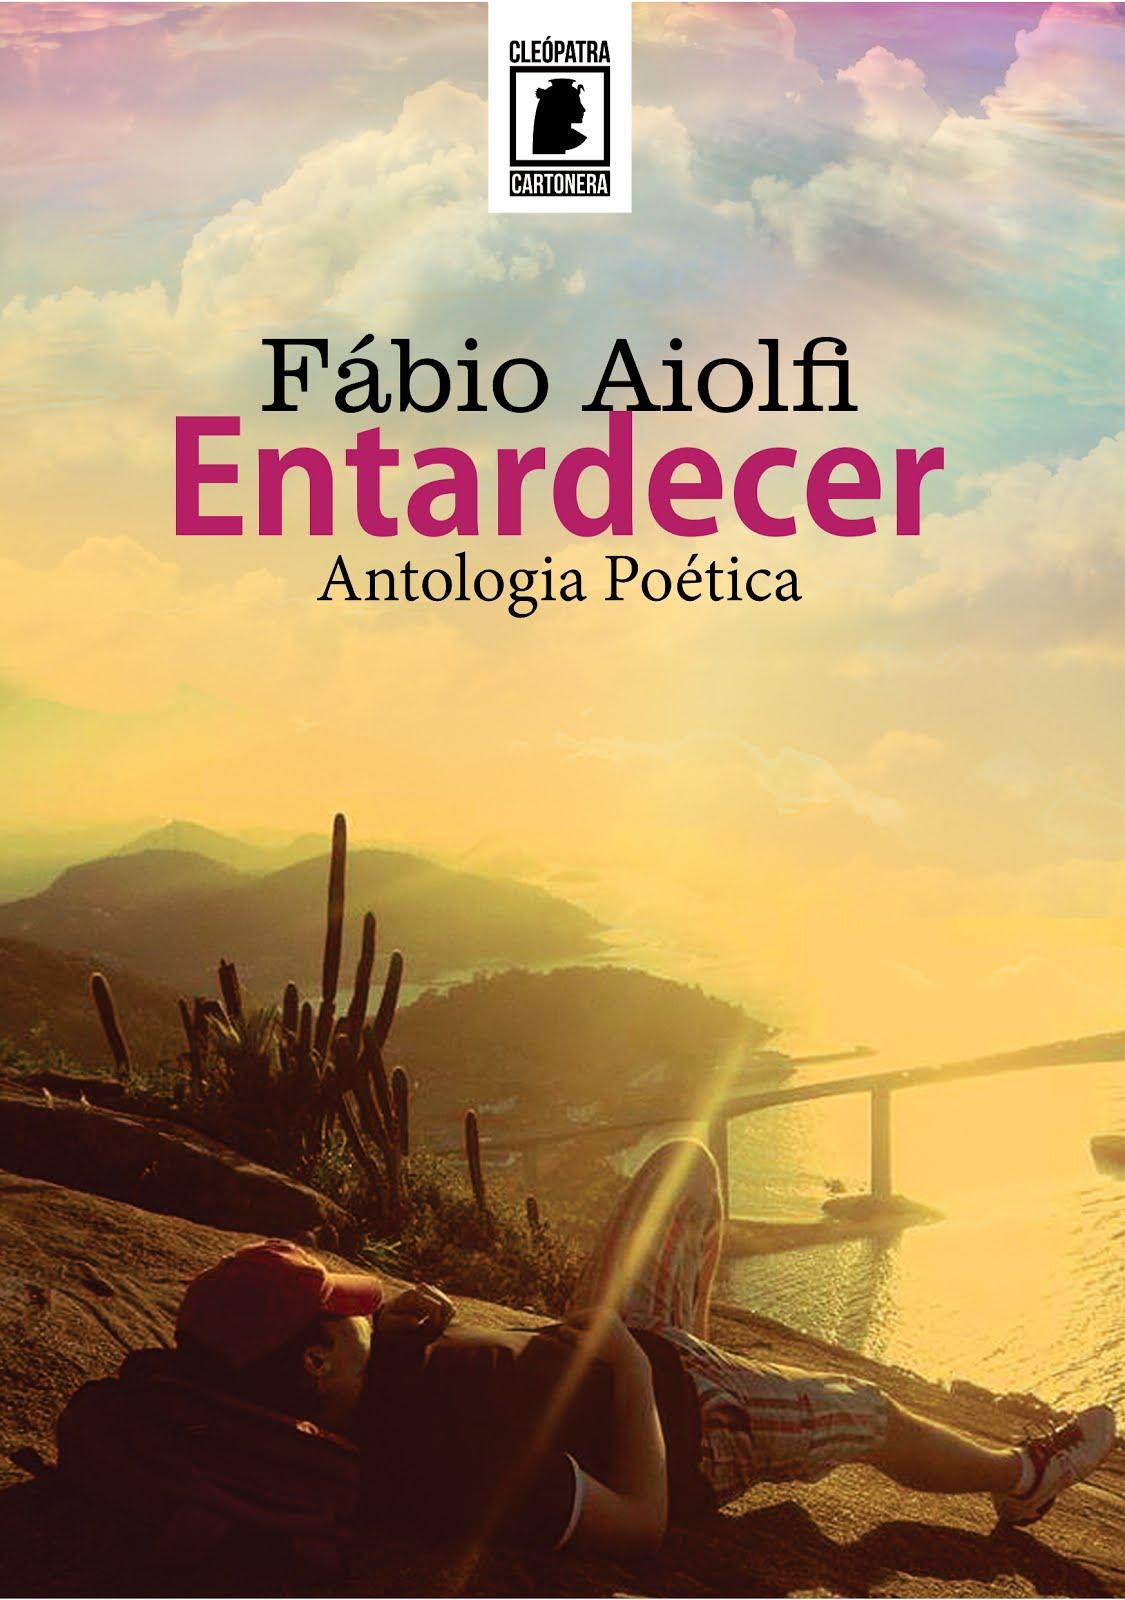 Entardecer - Antologia Poética